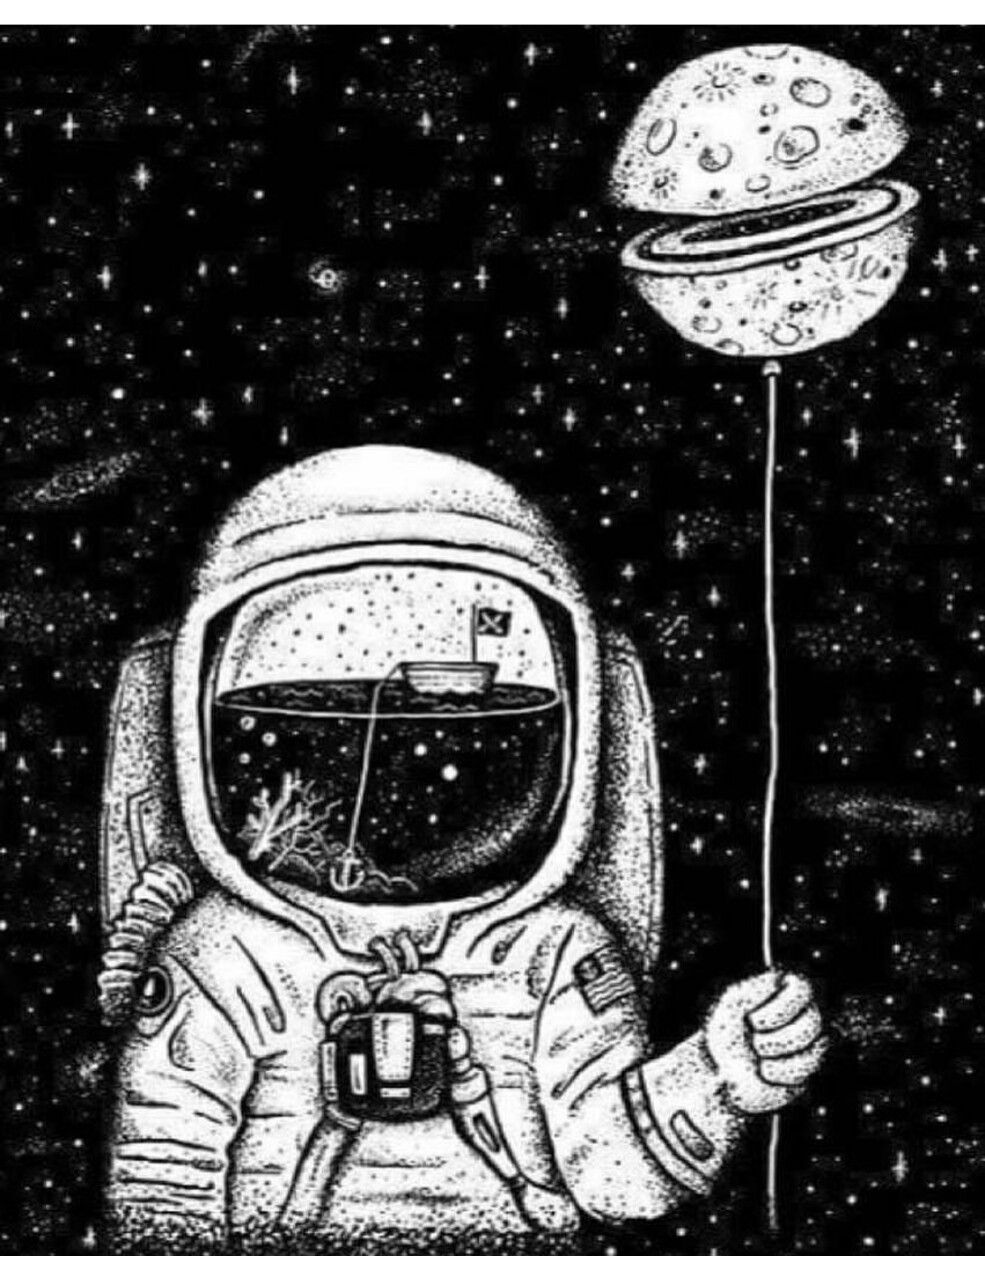 Trippy Space Wallpaper